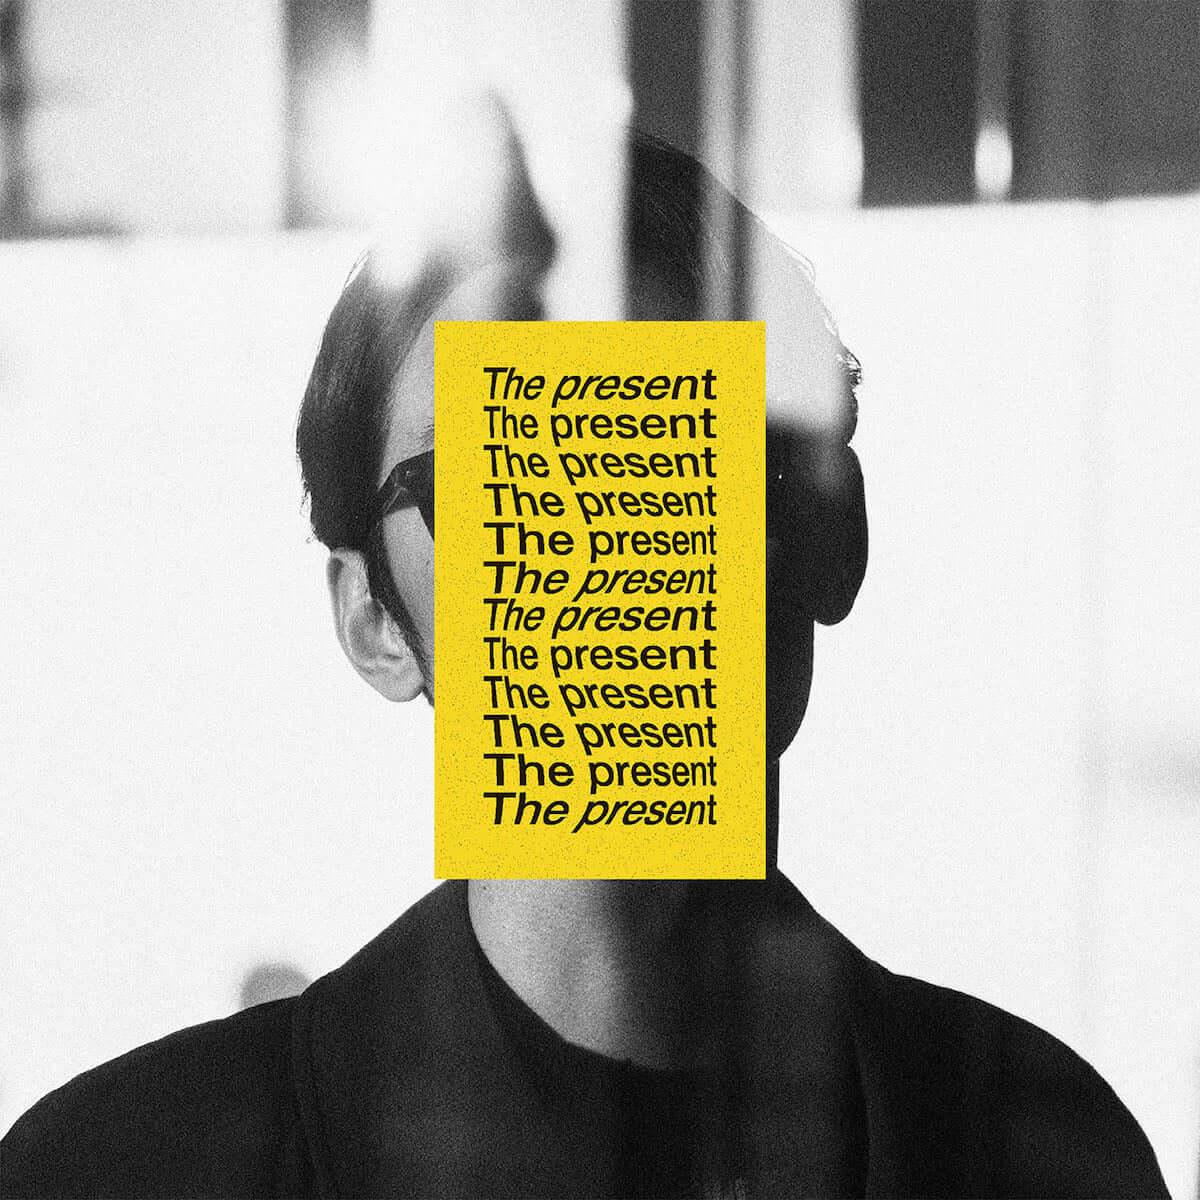 mabanua、HUNGERとコラボしたMVが解禁|TOKYO HEALTH CLUBのTSUBAME、1stアルバム『THE PRESENT』本日リリース music190417_tsubame_1-1200x1200